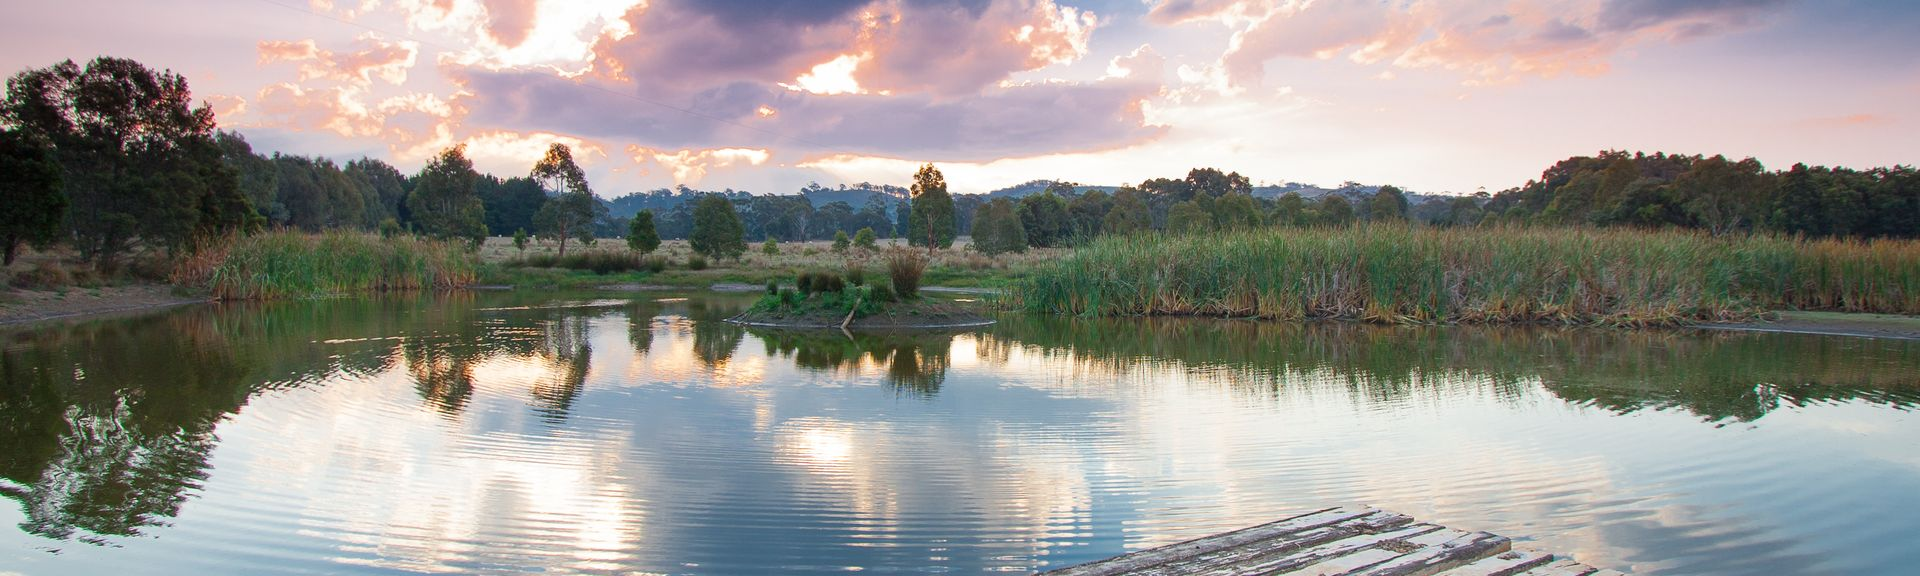 Kilmore Golf Club, Kilmore, Victoria, Australia